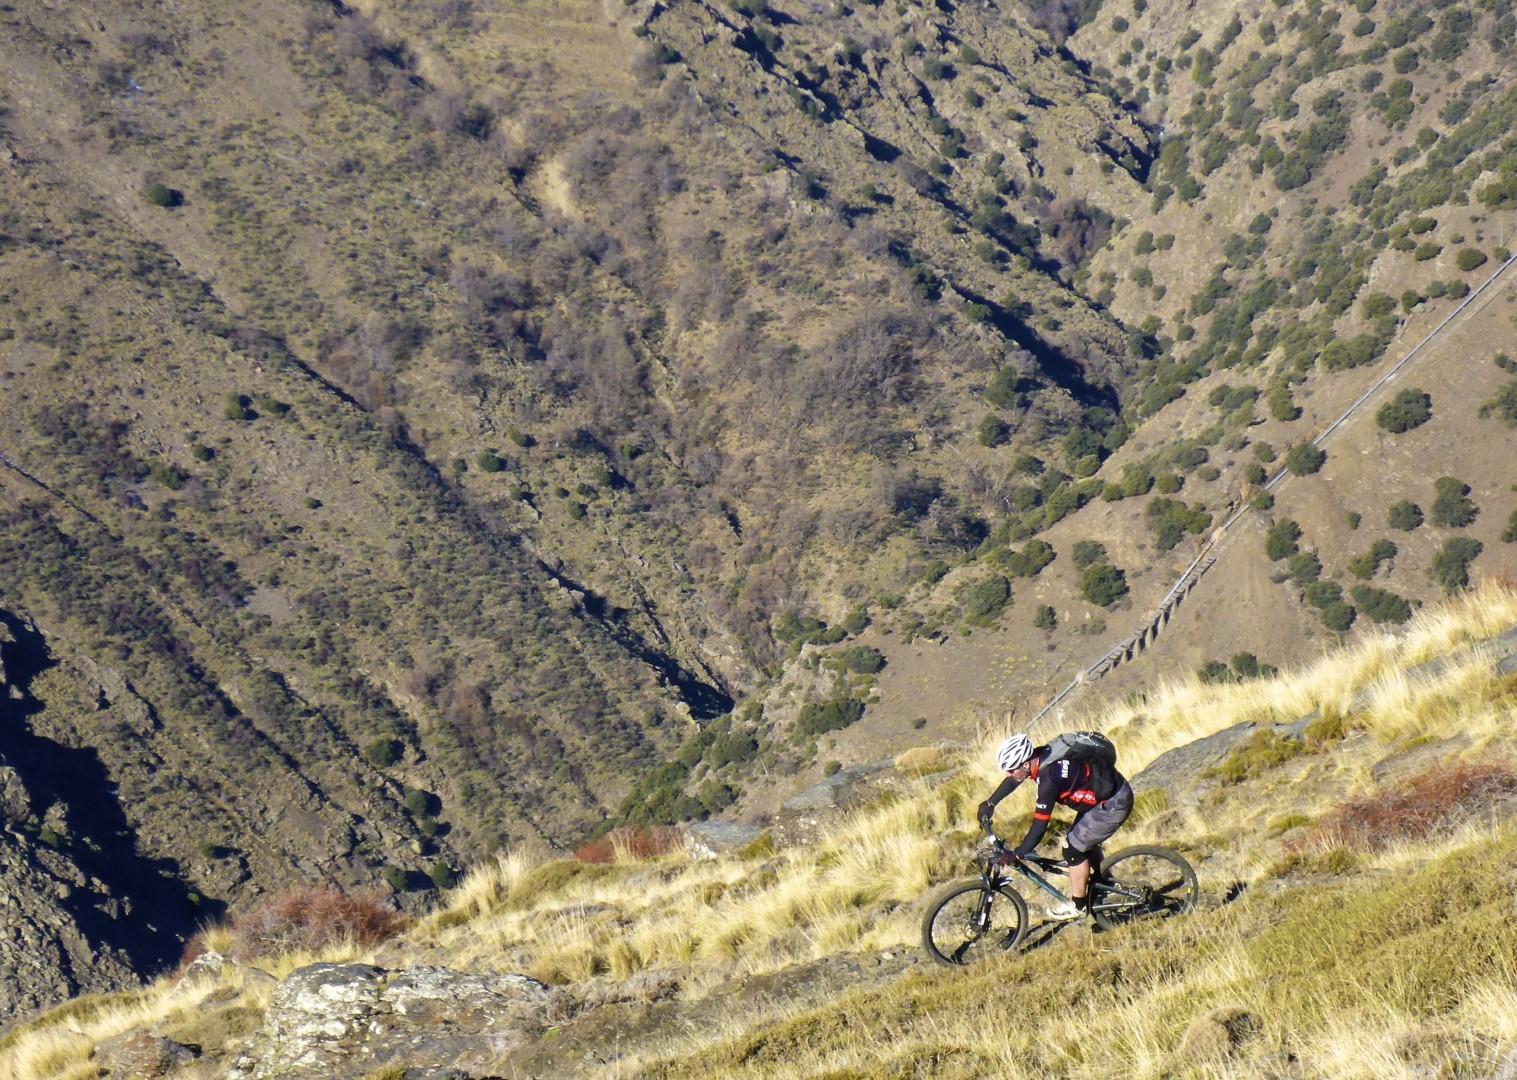 guided-mountain-bike-holiday-in-spain-in-sierra-nevada.jpg - Spain - Sensational Sierra Nevada - Mountain Biking